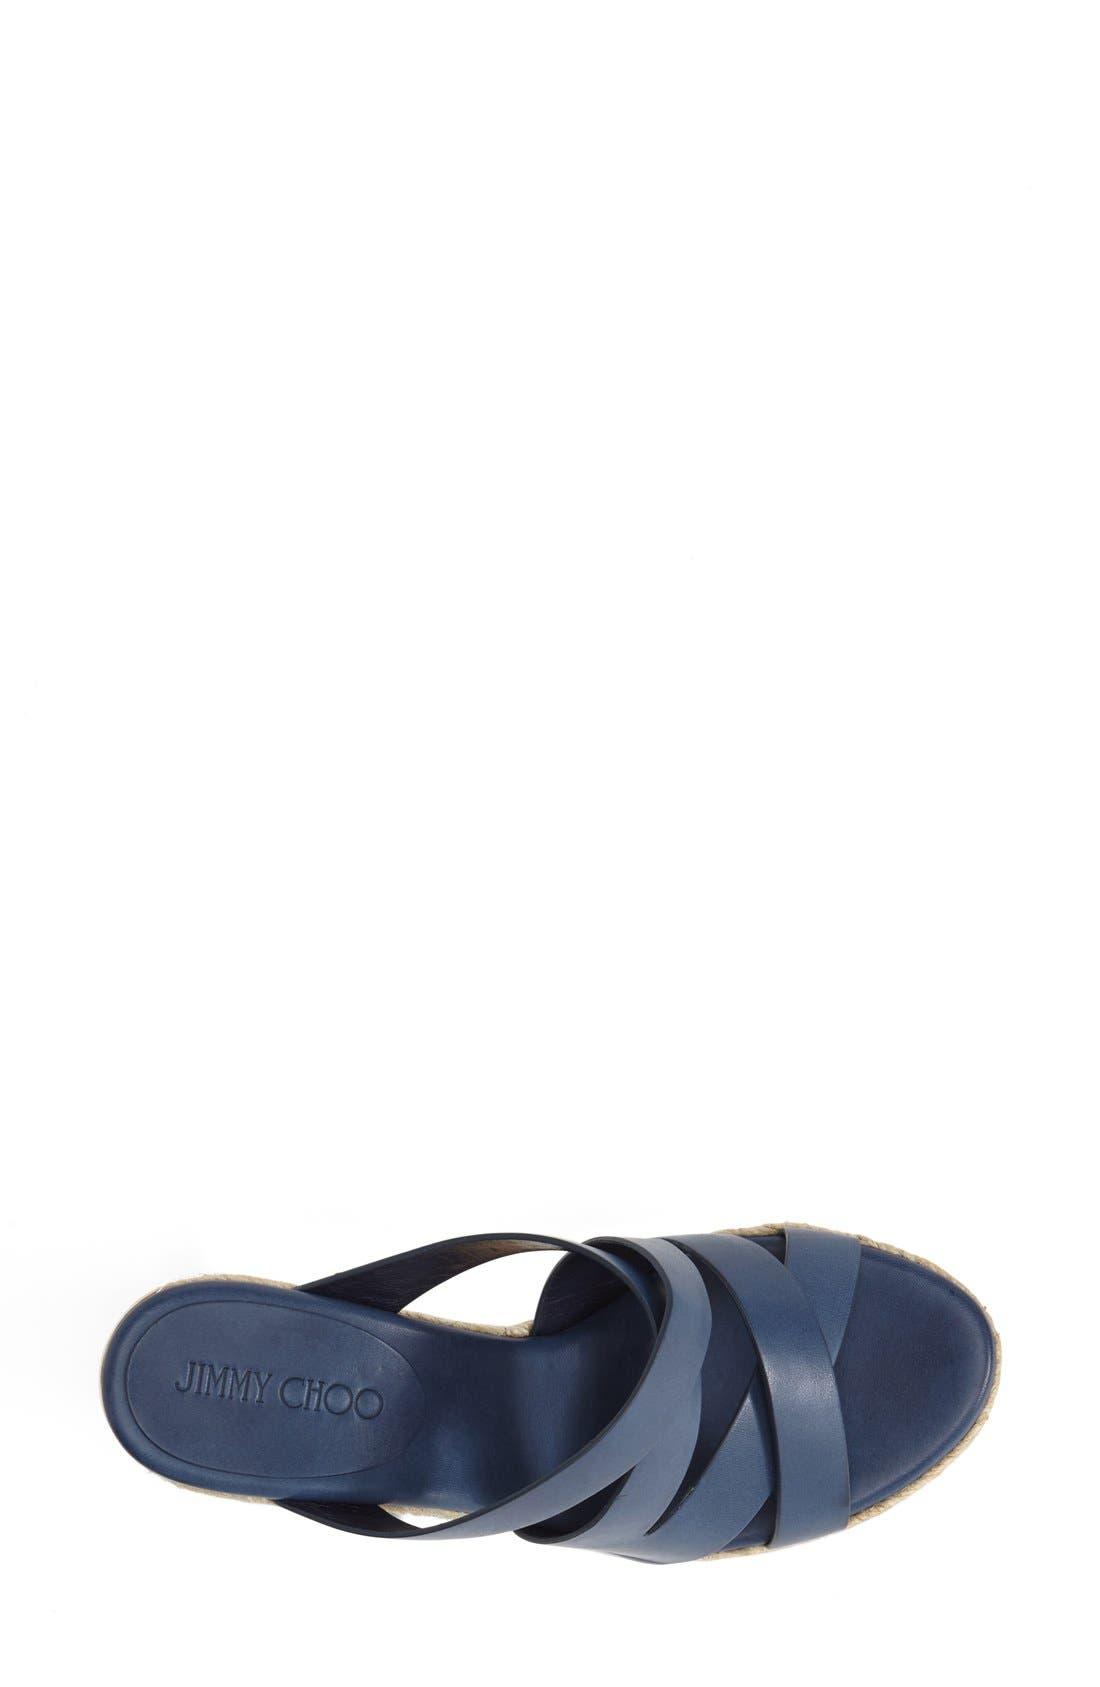 'Prisma' Leather Wedge Sandal,                             Alternate thumbnail 3, color,                             400